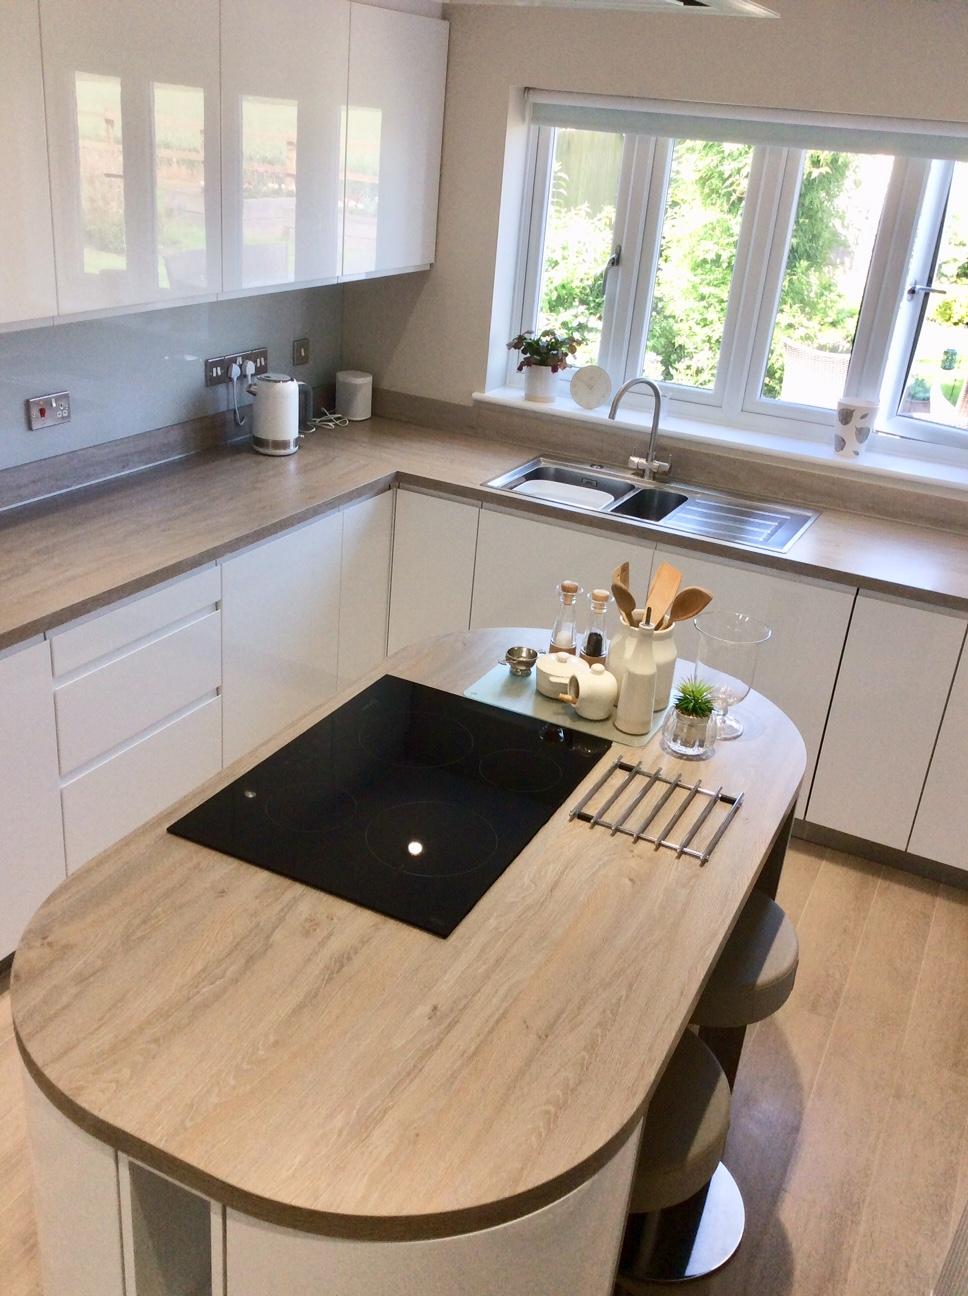 Schüller Alea, Aqueous Kitchen and Bathooms, Princes Risborough, Buckinghamshire